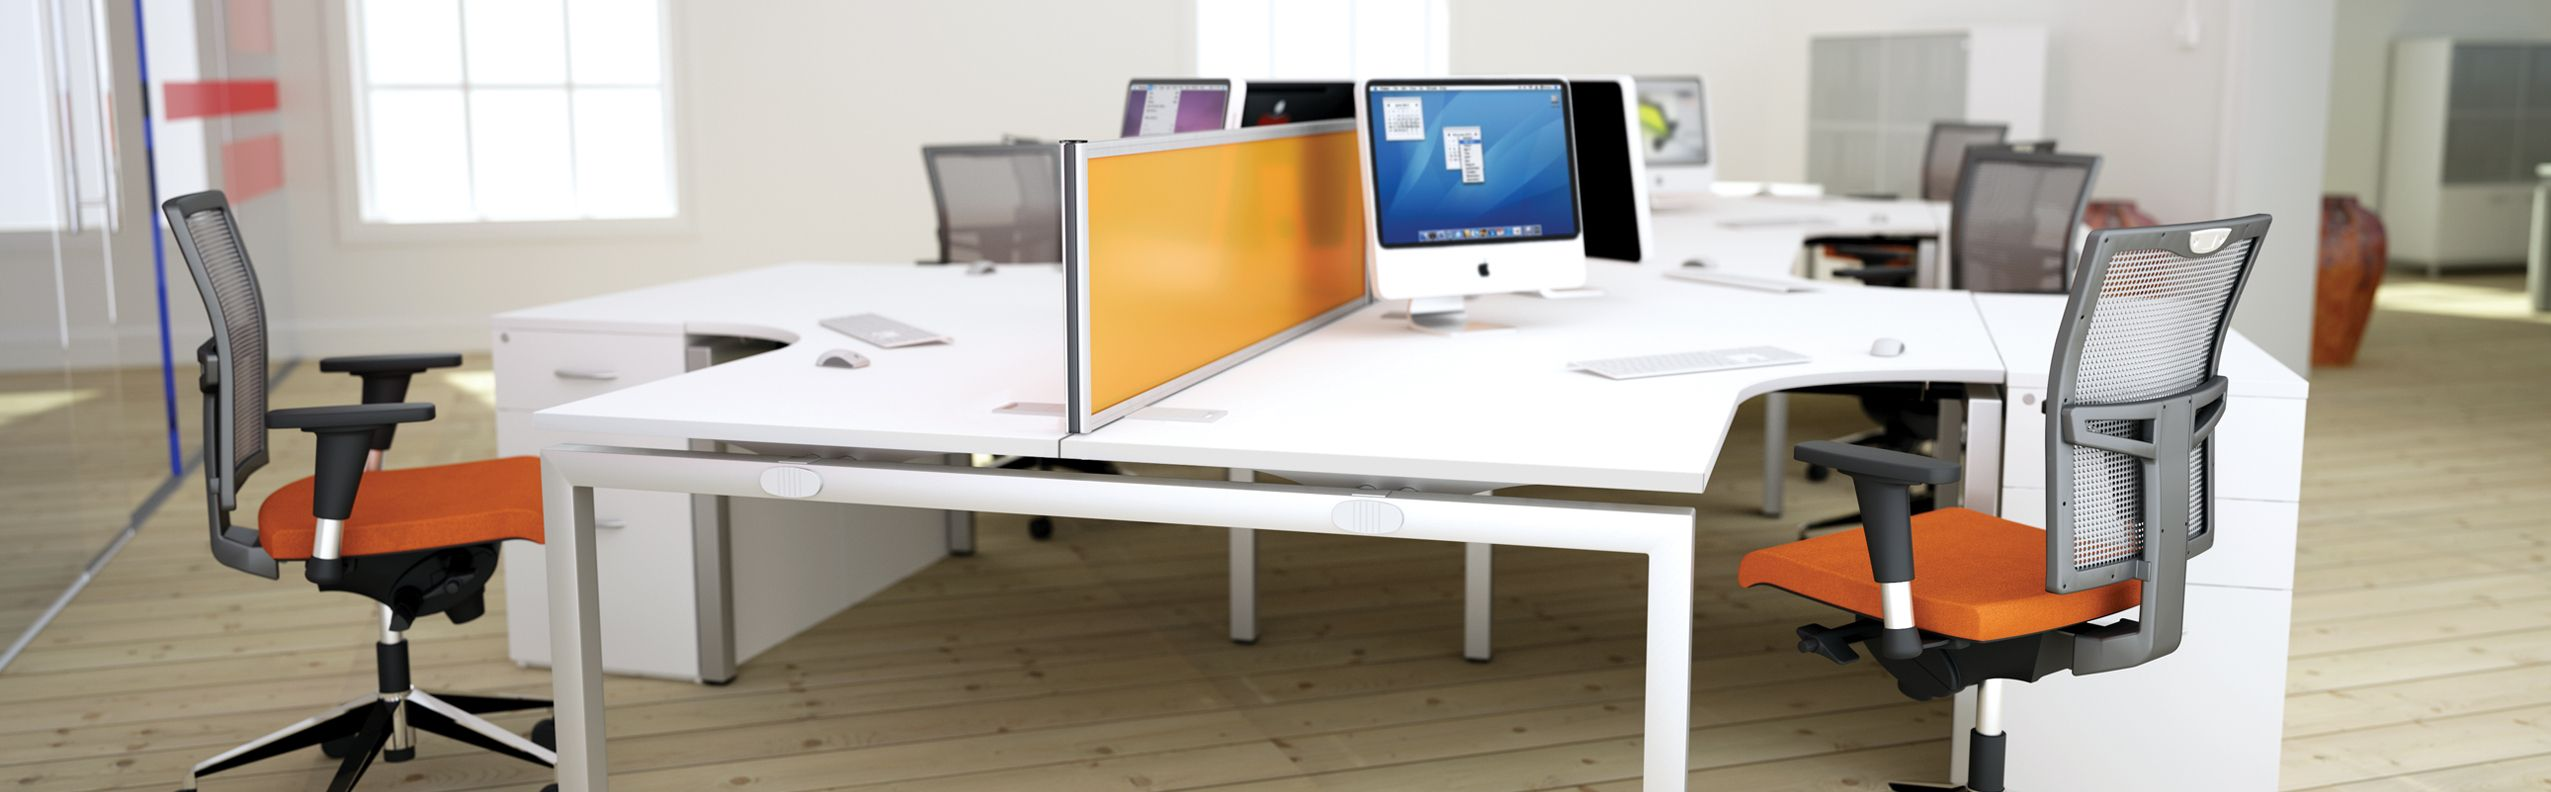 Büro Möbel Bristol Office Möbel - Bürozubehör | BüroMöbel ...